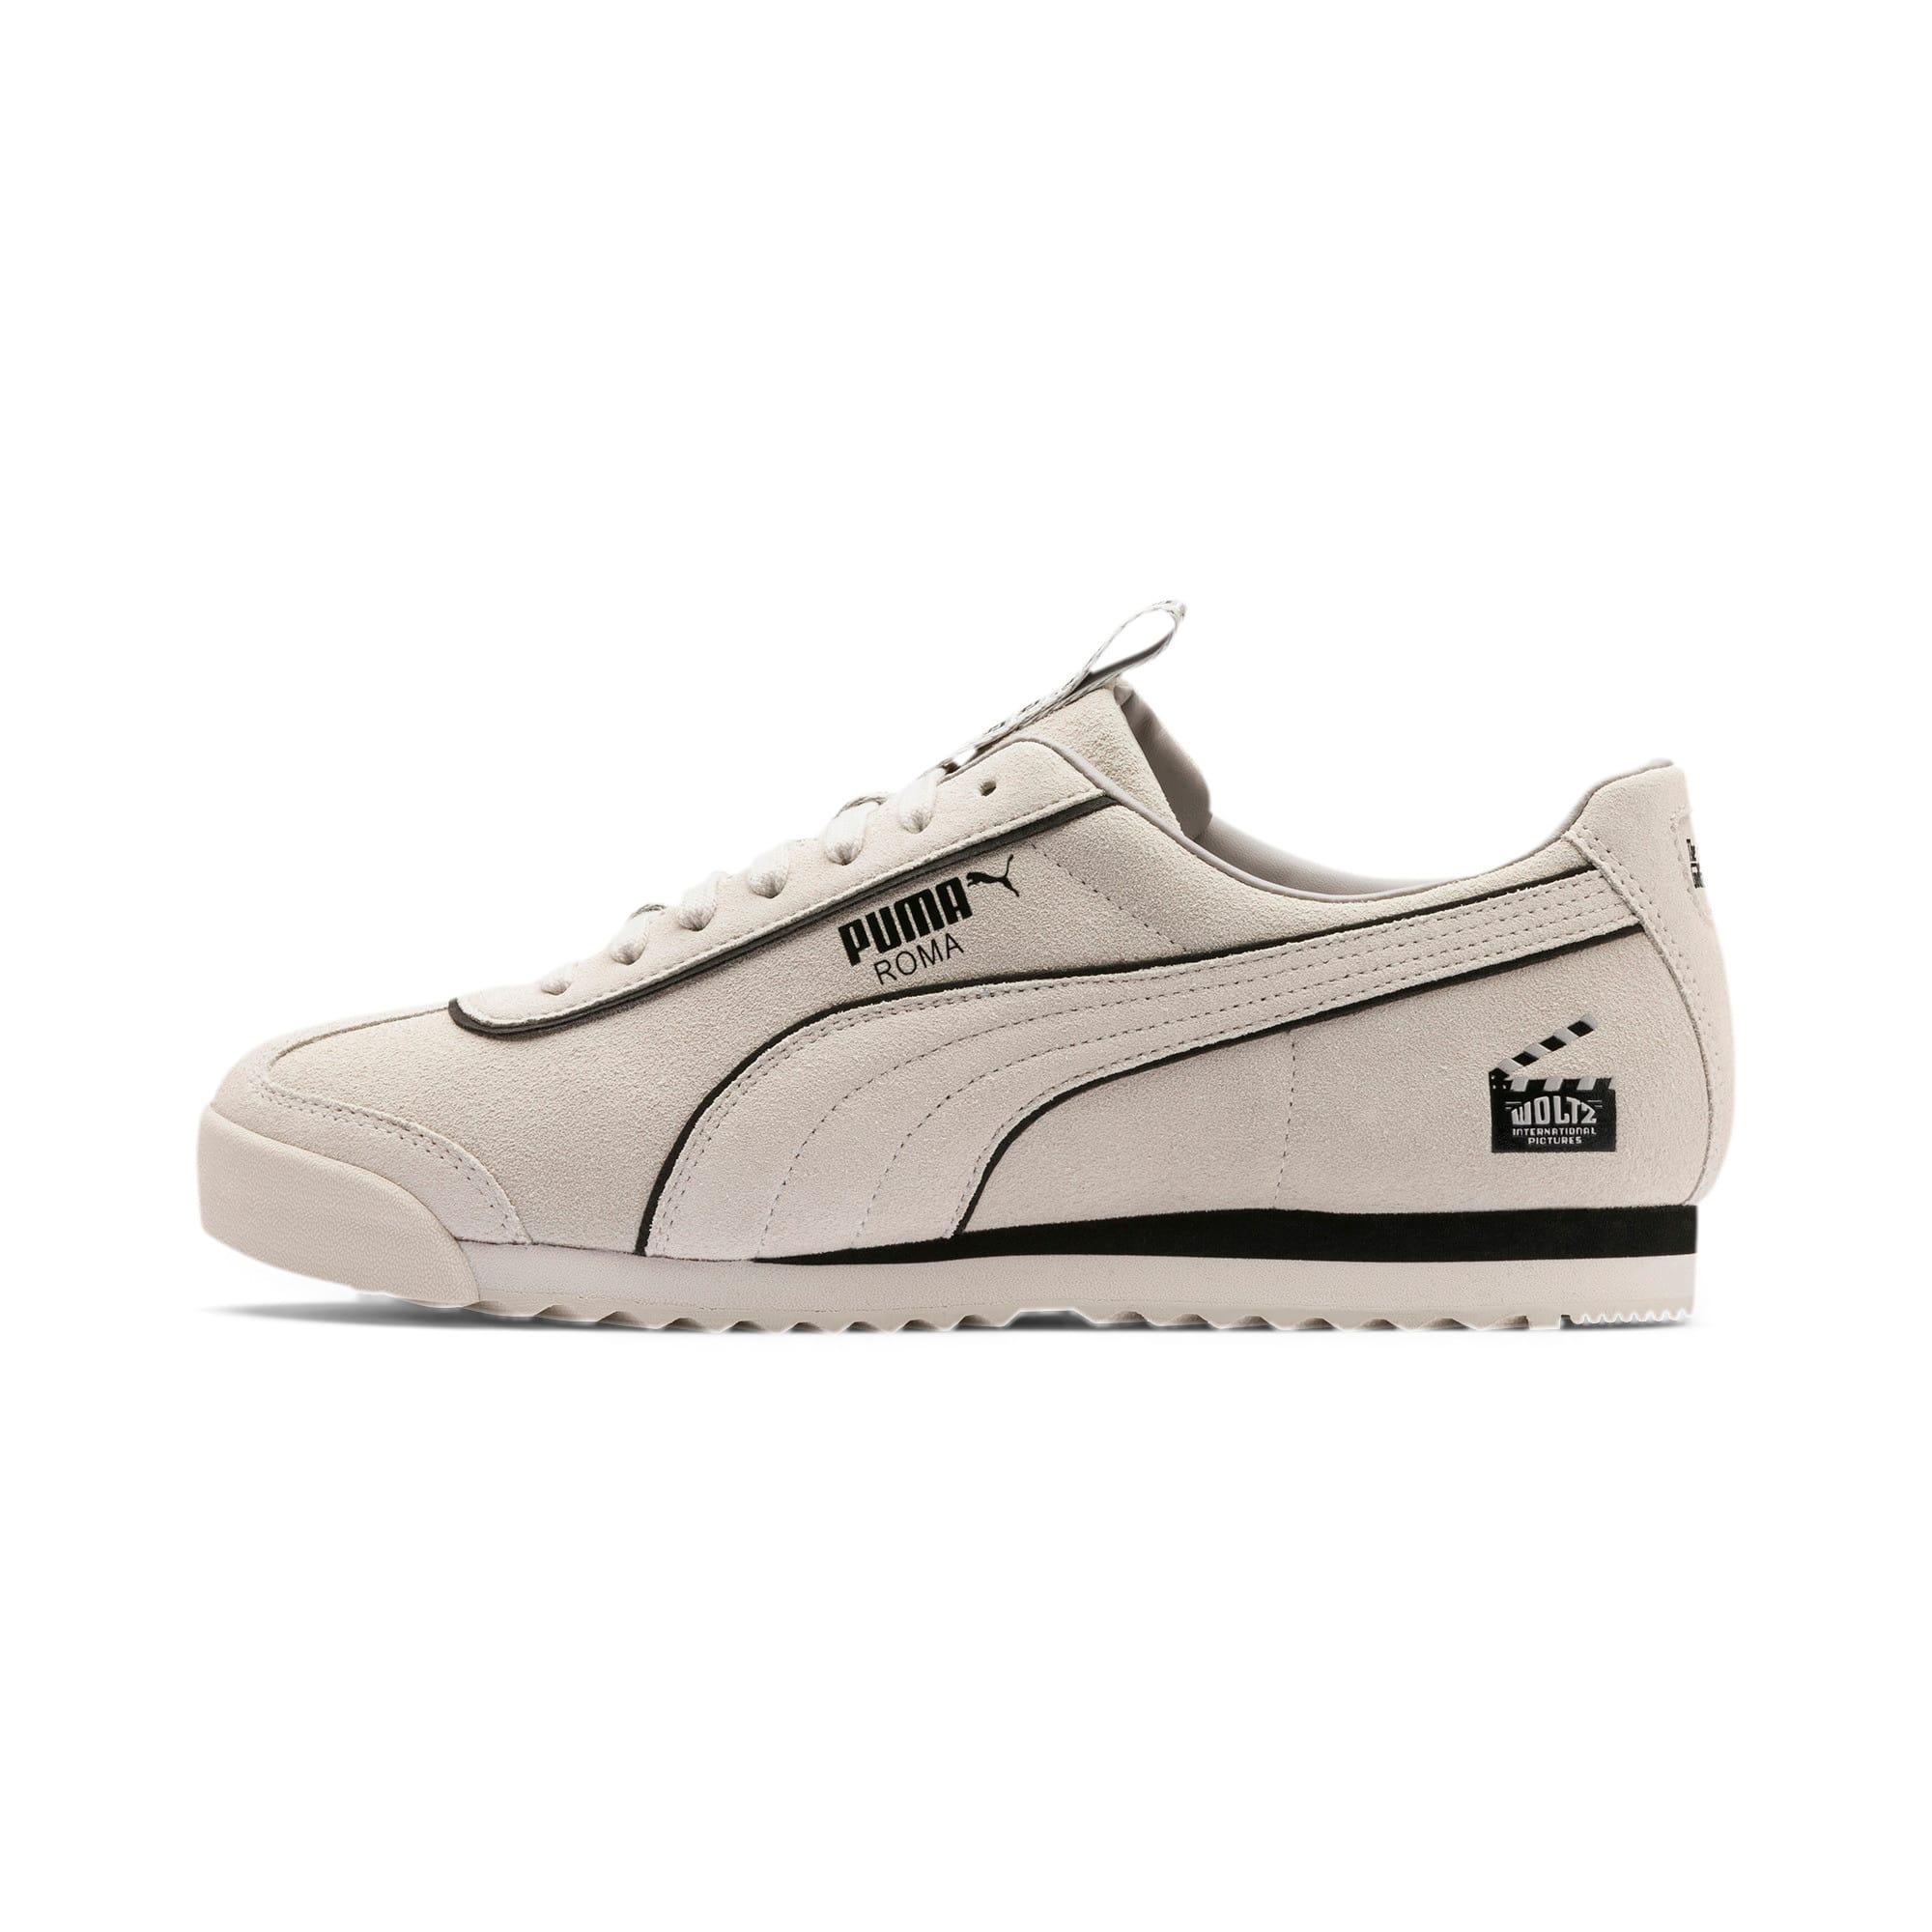 Miniatura 1 de Zapatos deportivos PUMA x THE GODFATHER Roma Woltz, WINDCHIME-Puma negro, mediano